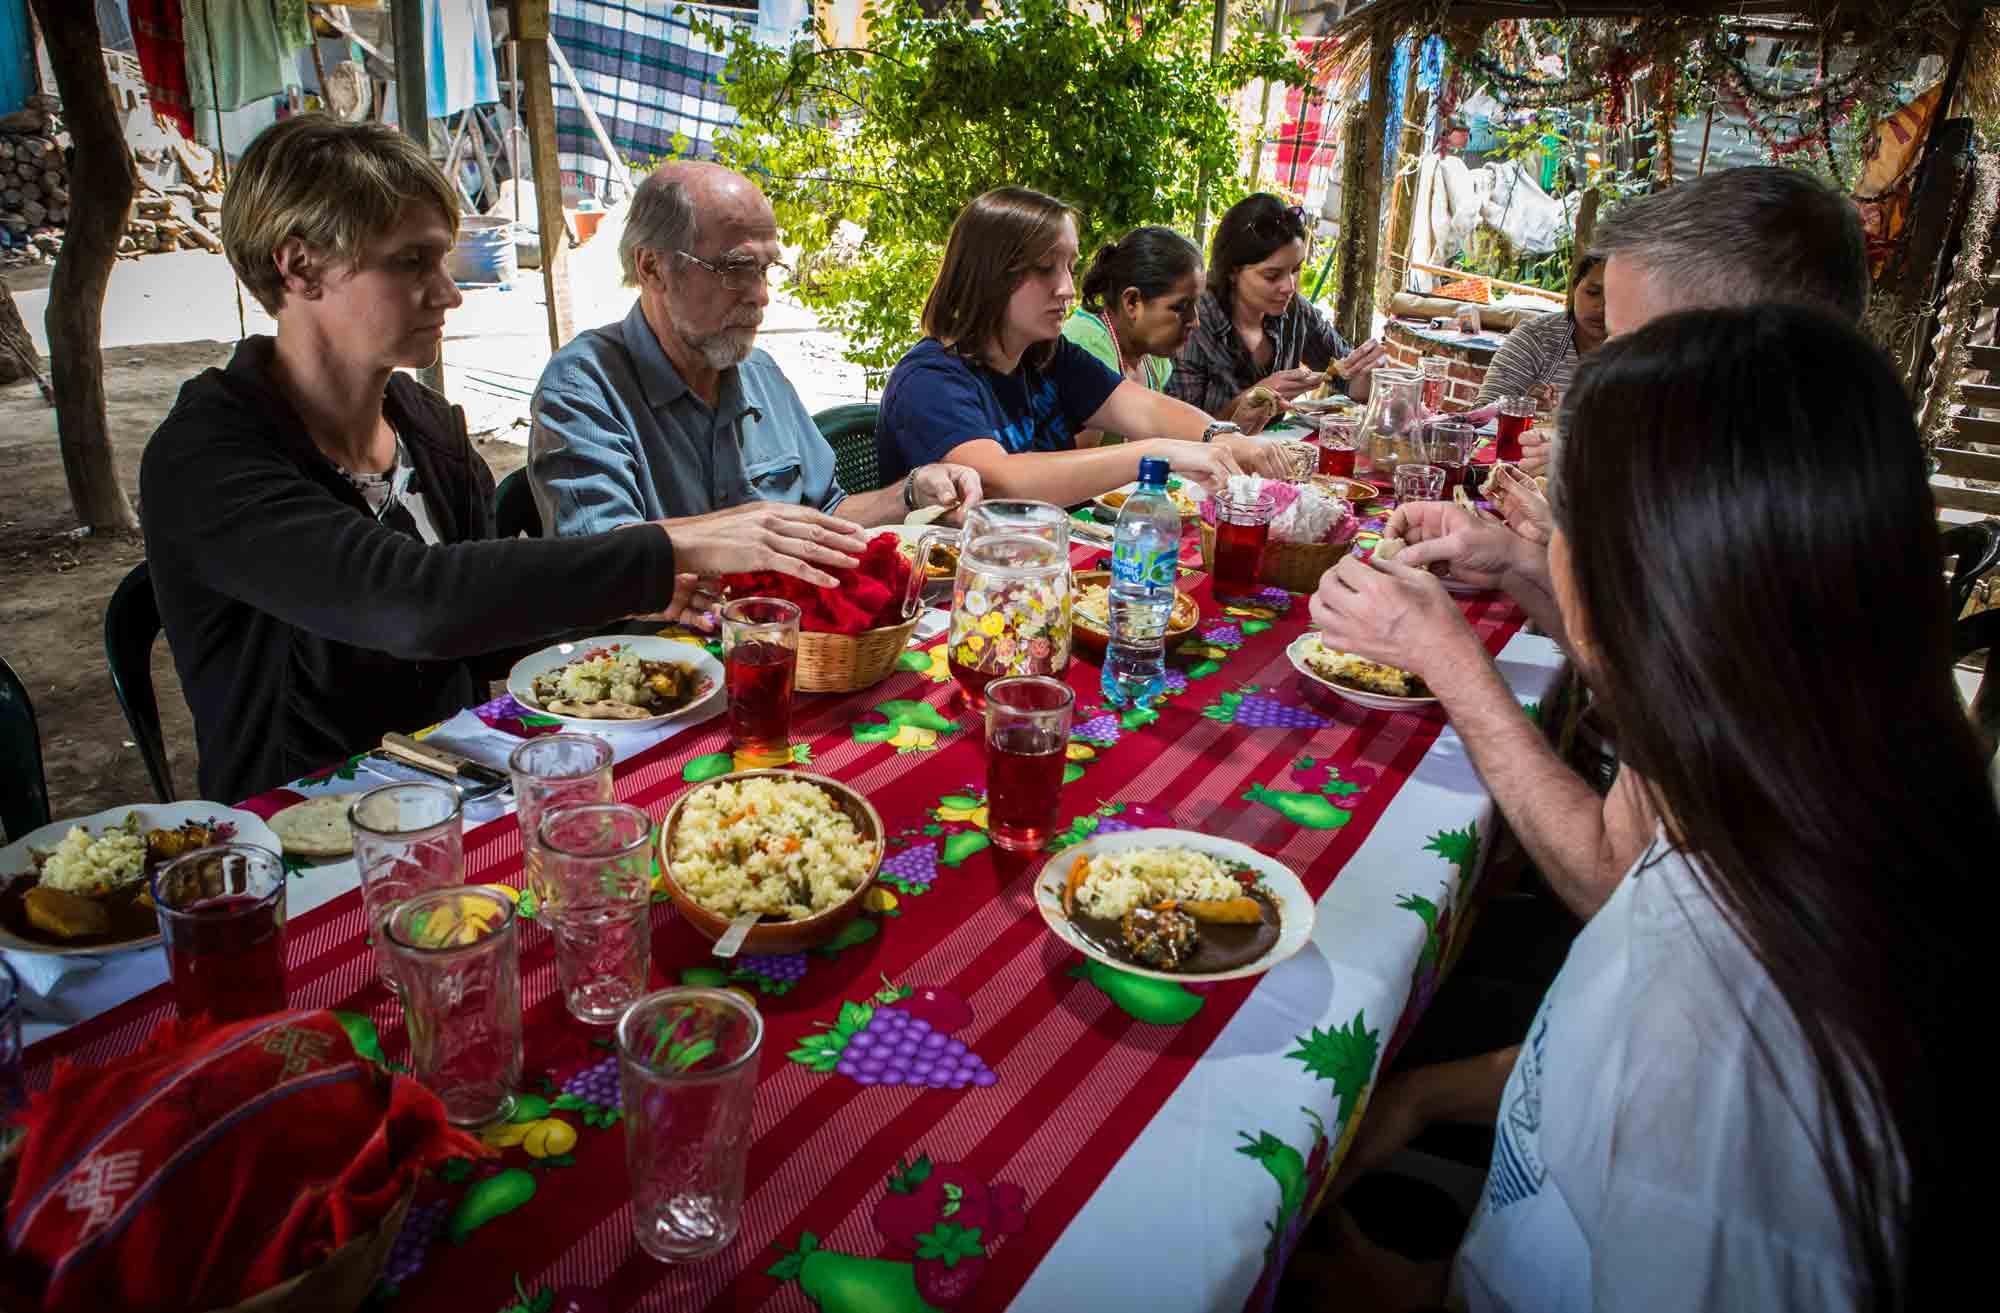 At-table-eating-pepian.jpg